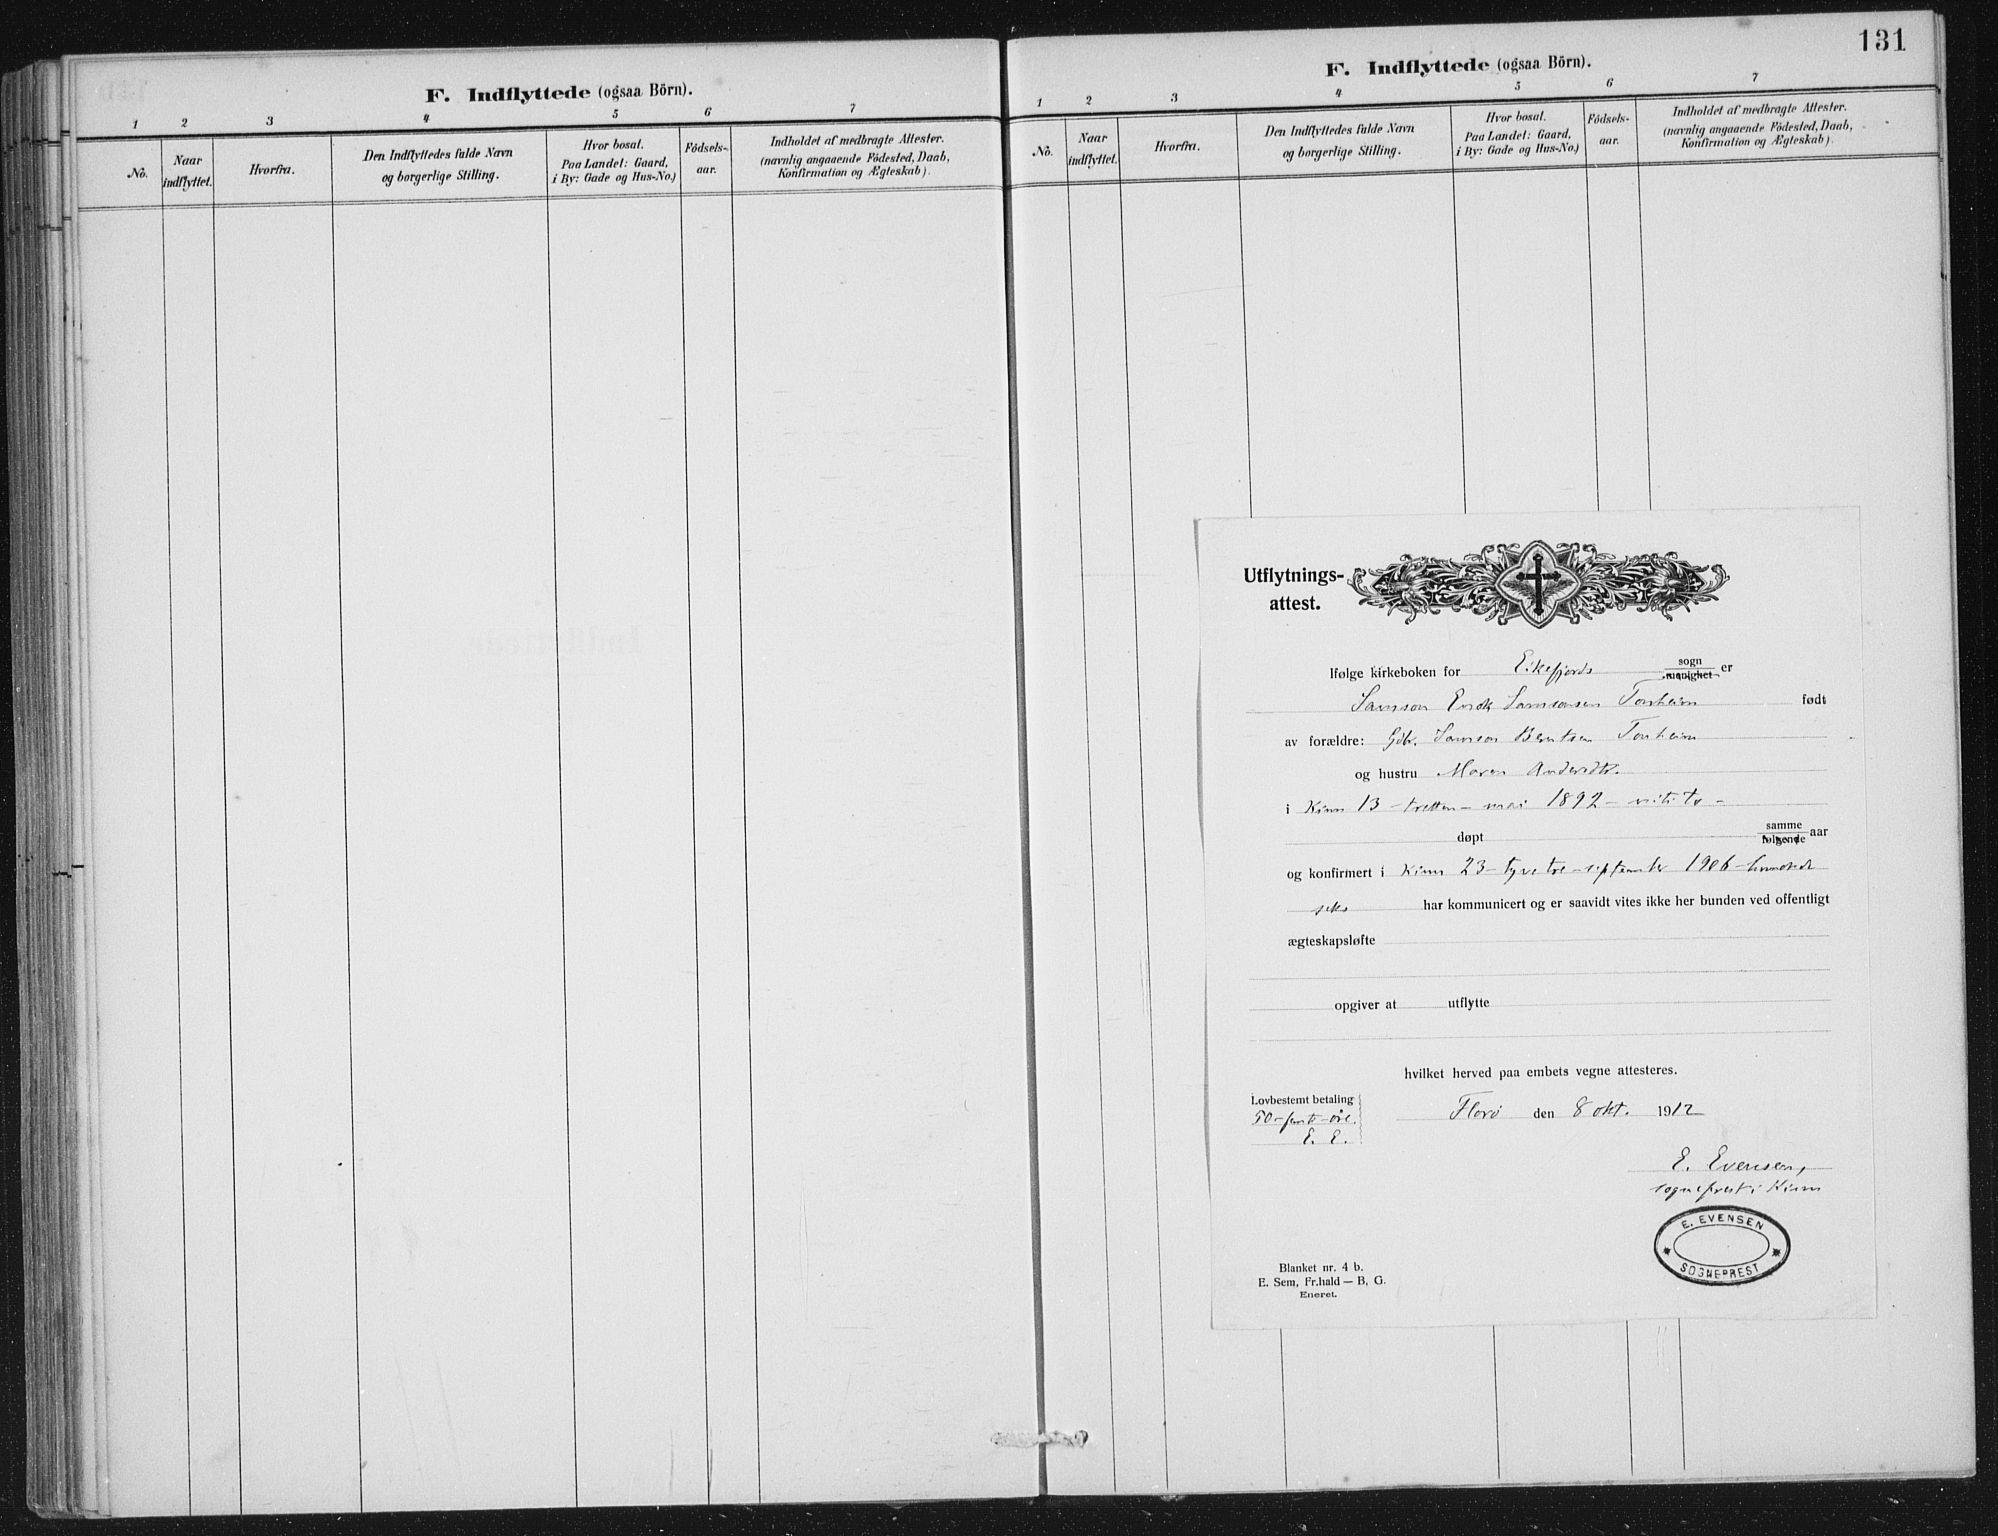 SAB, Kinn sokneprestembete, H/Haa/Haae/L0001: Ministerialbok nr. E 1, 1890-1916, s. 131